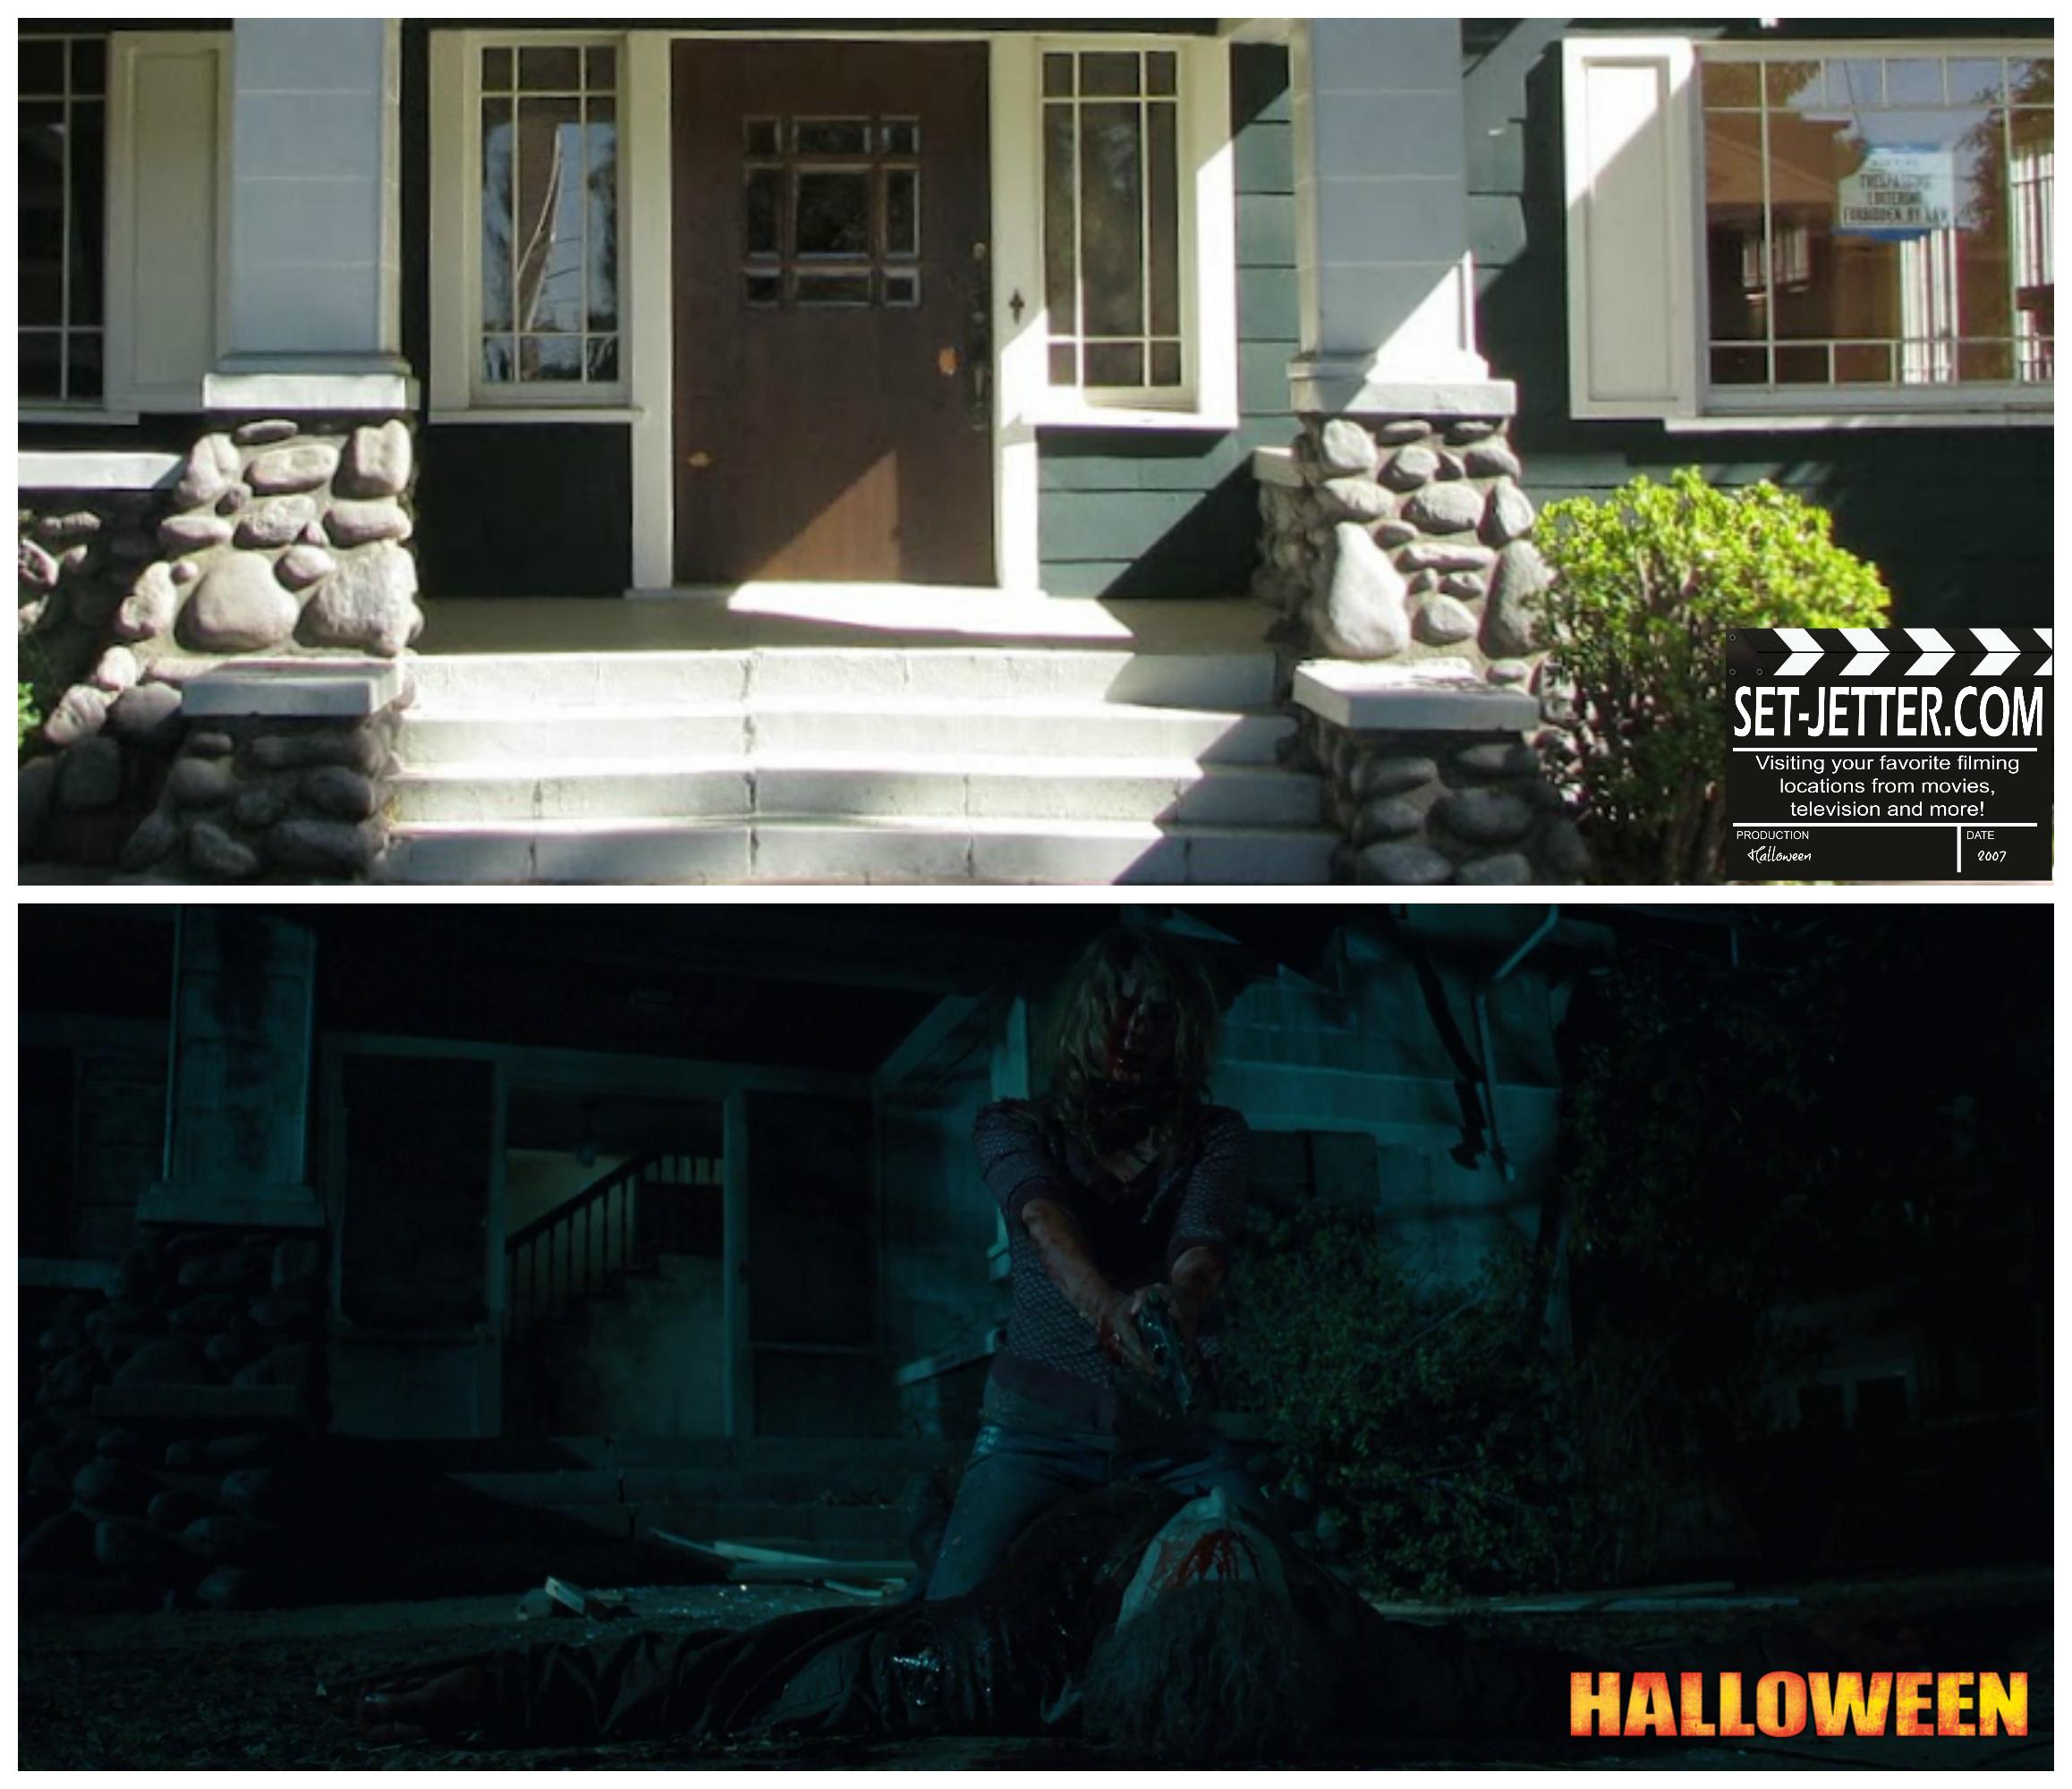 Halloween 2007 comparison 21.jpg